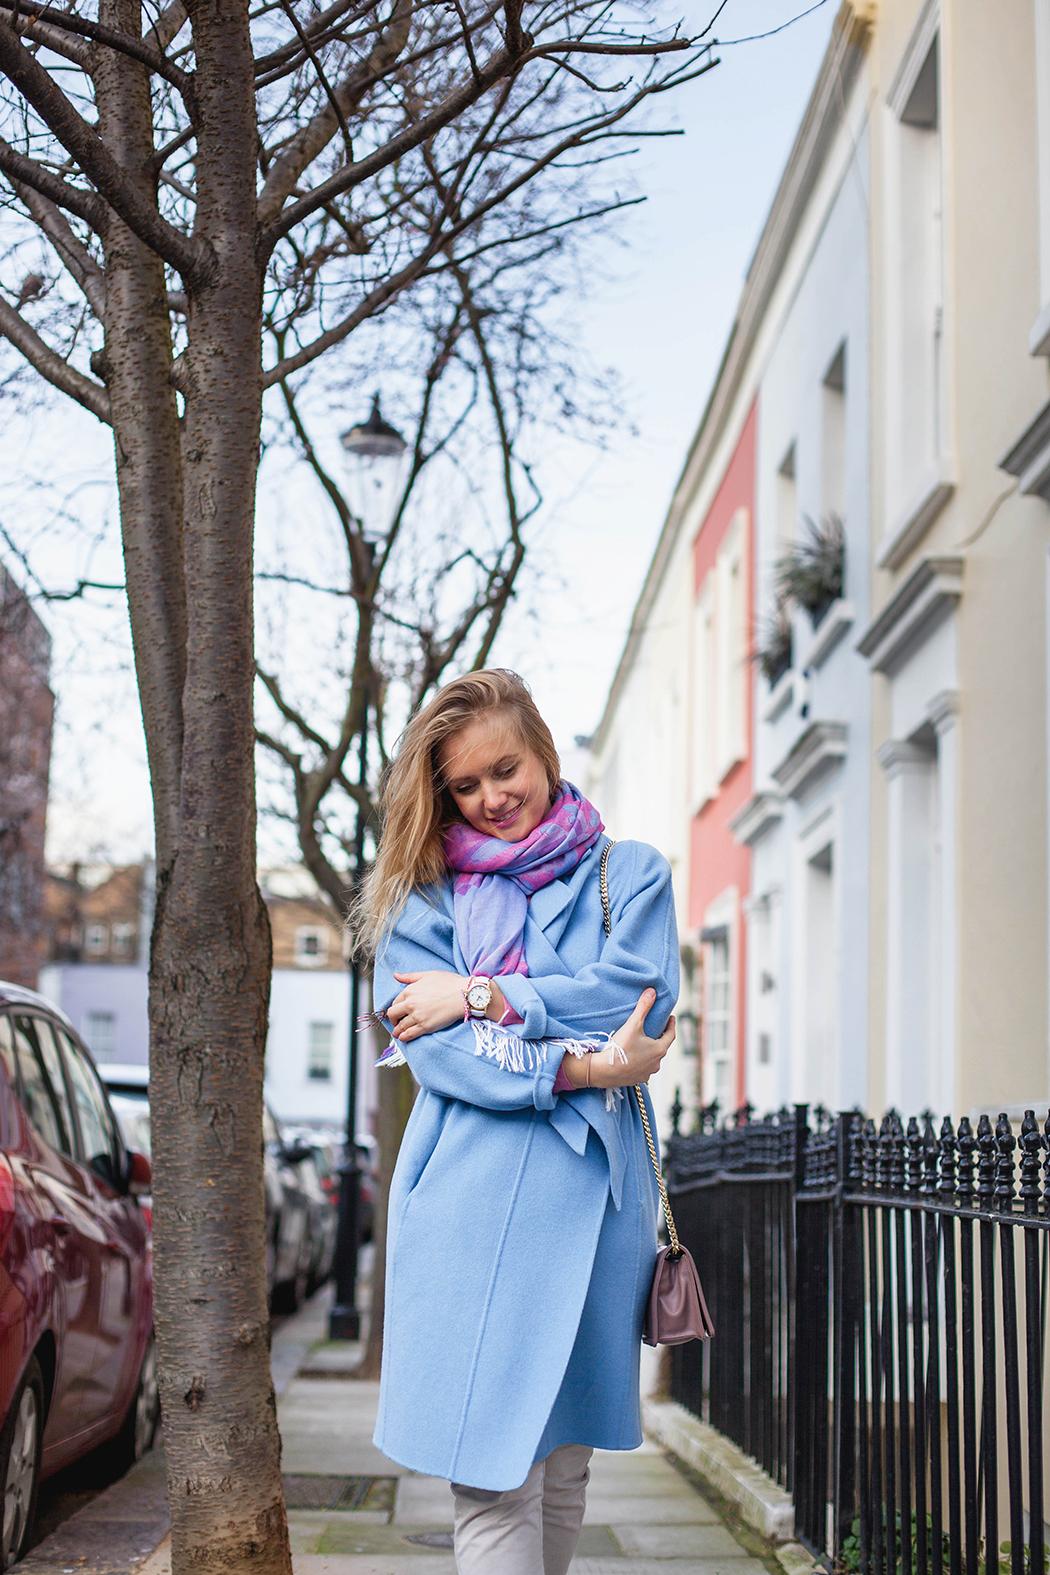 inspiration, streetstyle, spring outfit, annamidday, top fashion blogger, top russian fashion blogger, фэшн блогер, русский блогер, известный блогер, топовый блогер, russian bloger, top russian blogger, streetfashion, russian fashion blogger, blogger, fashion, style, fashionista, модный блогер, российский блогер, ТОП блогер, ootd, lookoftheday, look, популярный блогер, российский модный блогер, russian girl, пастельная одежда, с чем носить пастельную одежду, как сочетать пастельные цвета, pastel colors, pastel colors combination, цветовые сочетания, uniqlo, streetstyle, красивая девушка, pastel pants, pastel sweater, Анна миддэй, анна мидэй, uniqlo, blue coat, blue pastel coat, marc cain, calvin klein, philipp plein, pink& blue, pastel outfit, London, Kensington, nootting hill, лондон, лондон фотосессия, кенсингтон, ноттинг хилл, тревел блогер, тревел блог, блогер путешественник, travel blog, elisabetta franchi, elisabetta franchi bag